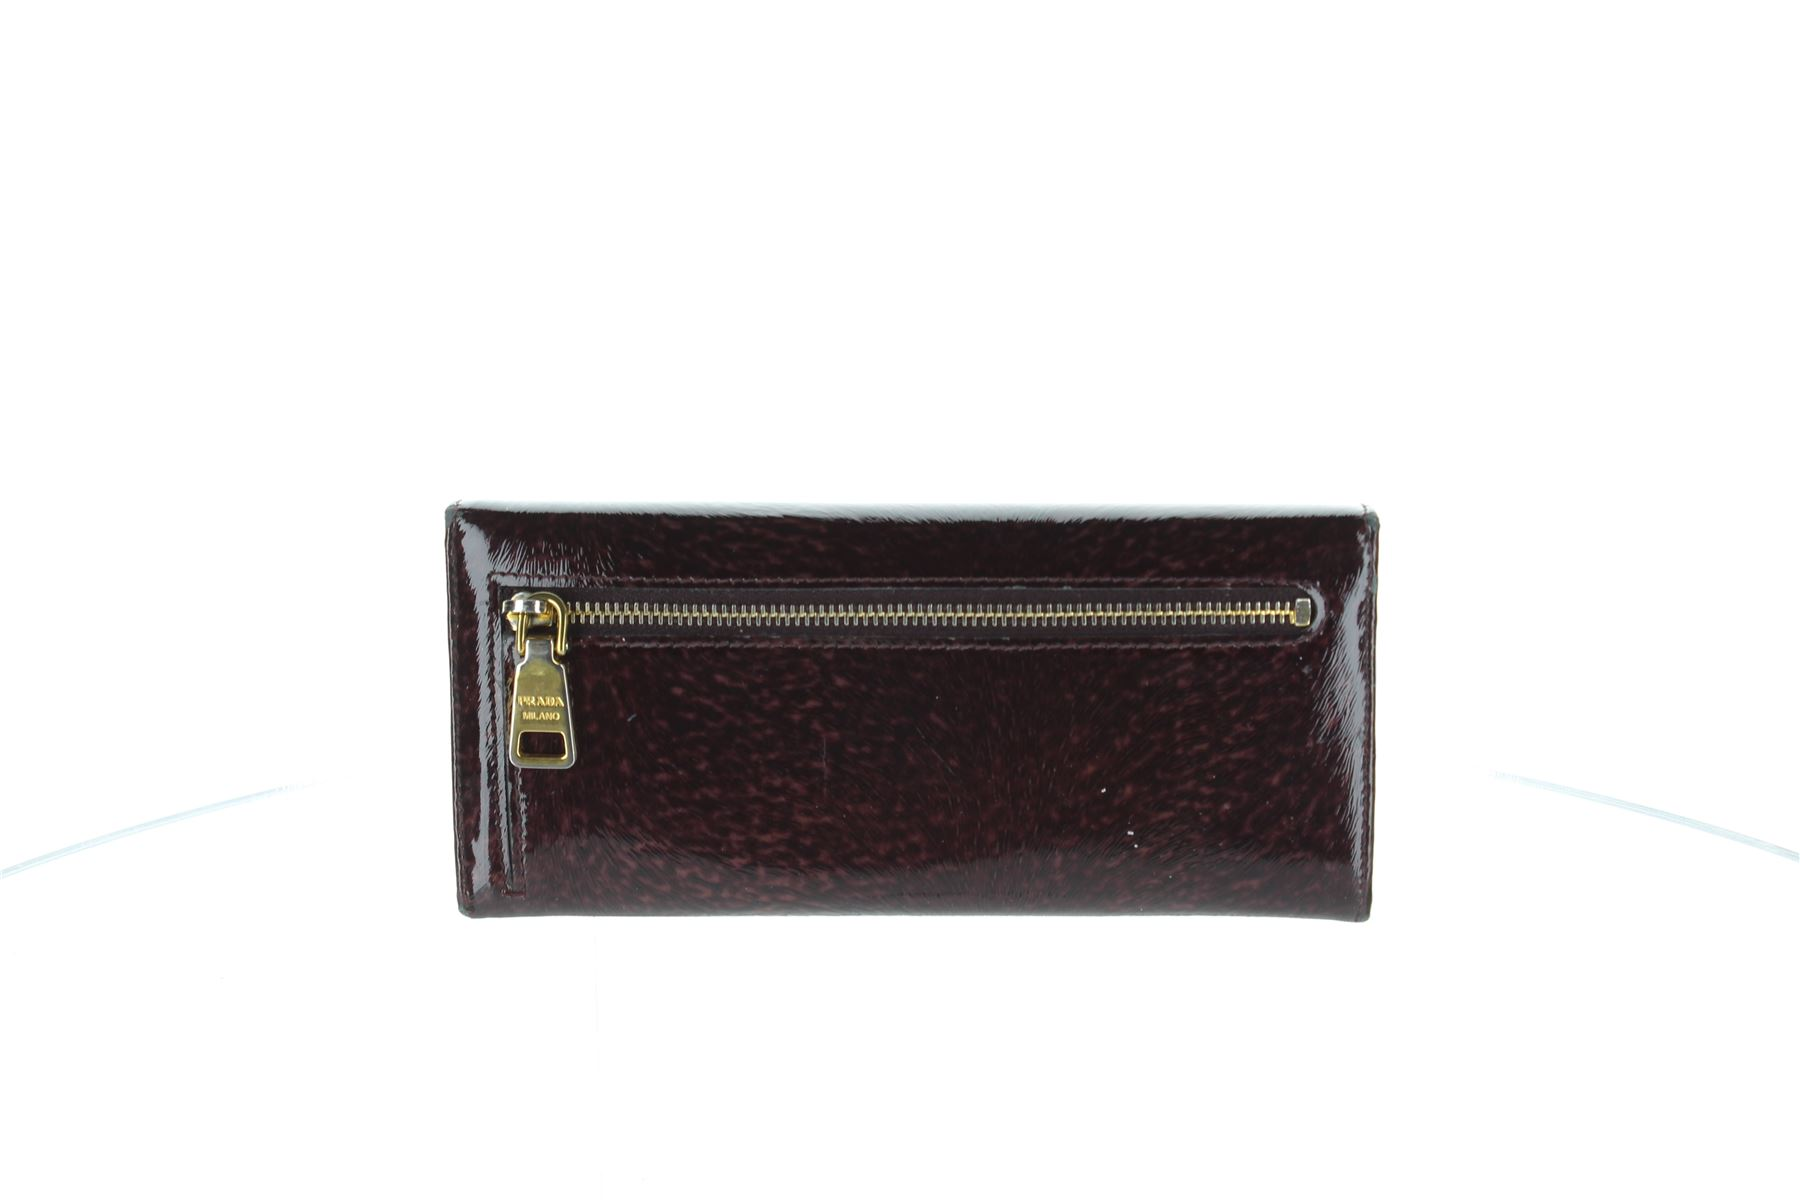 1d8a29883fa75e ... uk prada saffiano foldover purple patent leather wallet purse 3.4 x  1.25 x 7.5 5db76 4f0b9